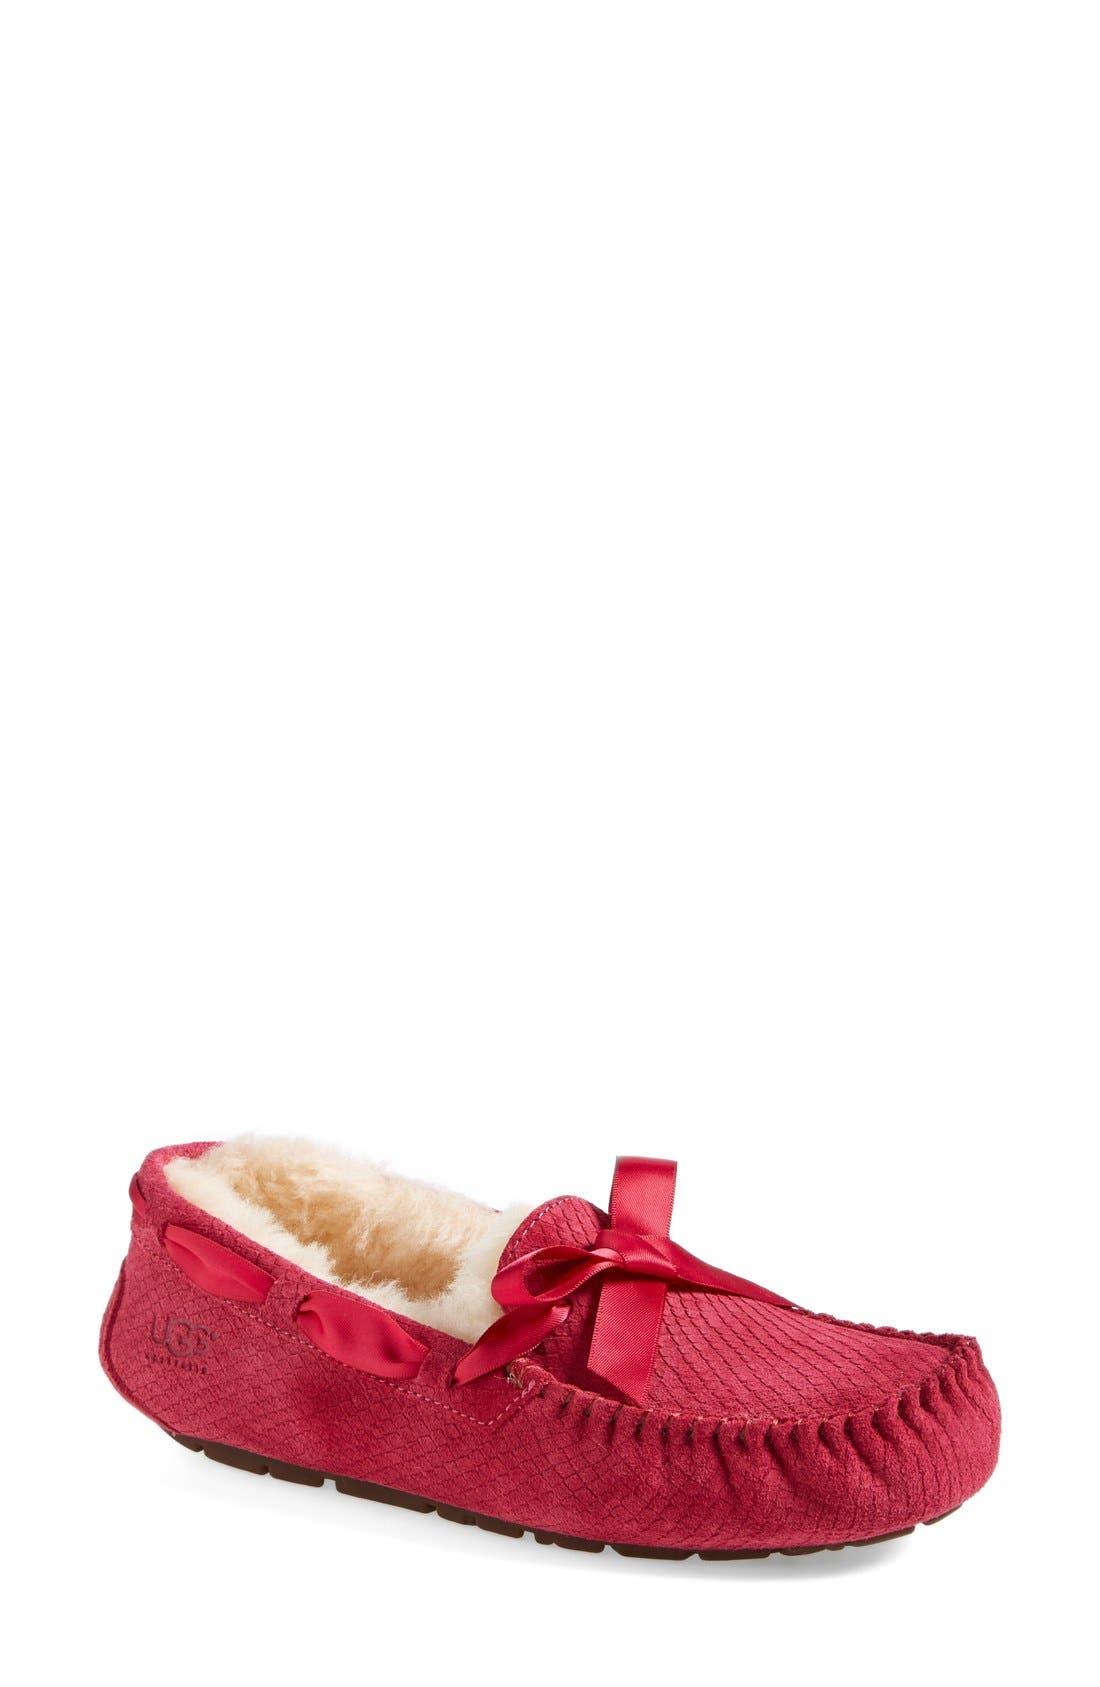 Alternate Image 1 Selected - UGG® Australia 'Dakota - Exotic Scales' Suede Slipper (Women)